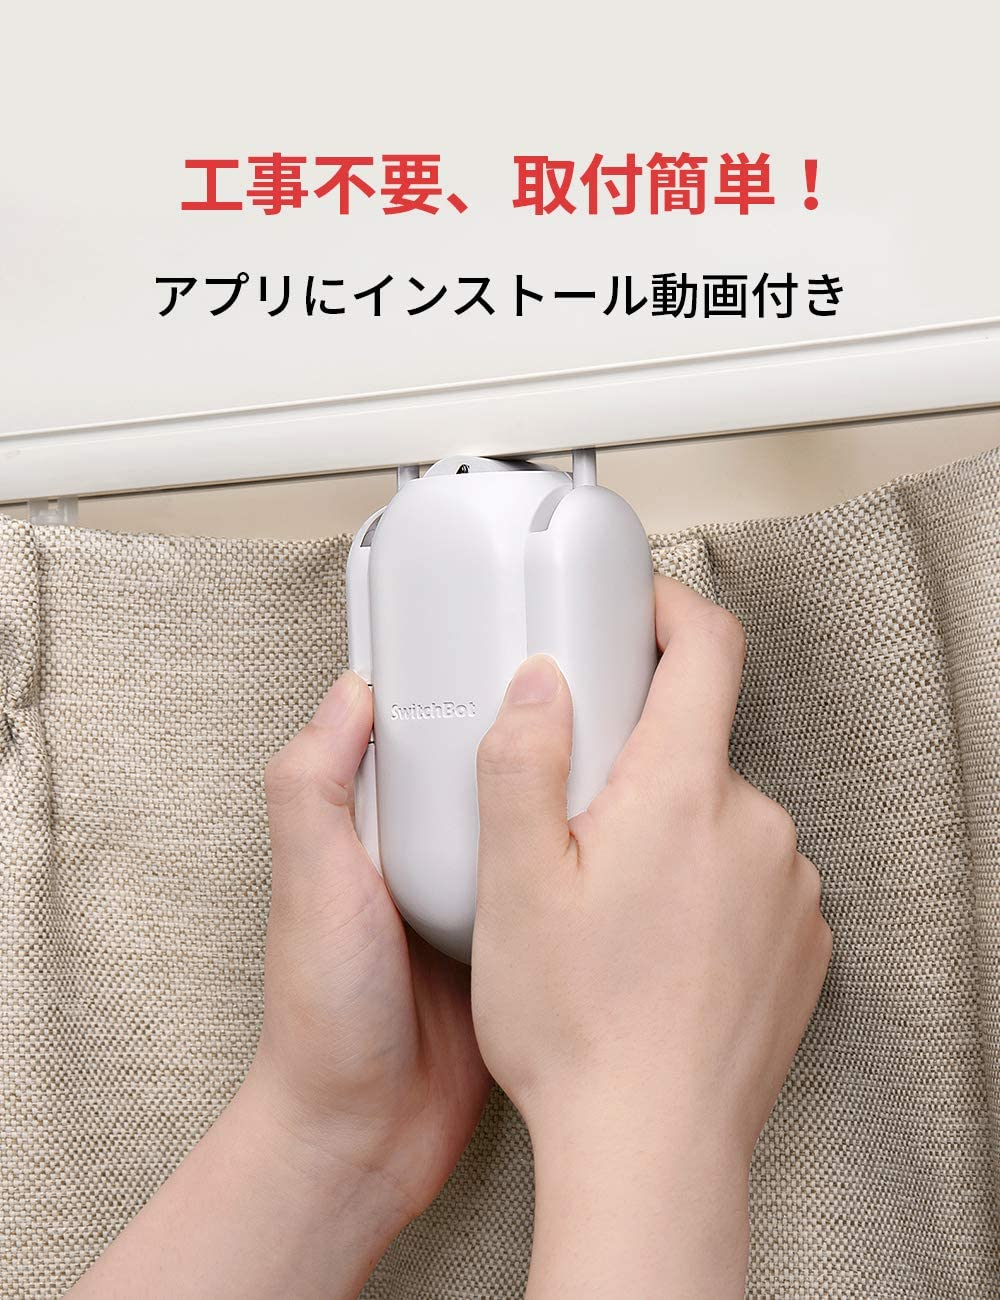 Switch Bot、カーテン自動開閉